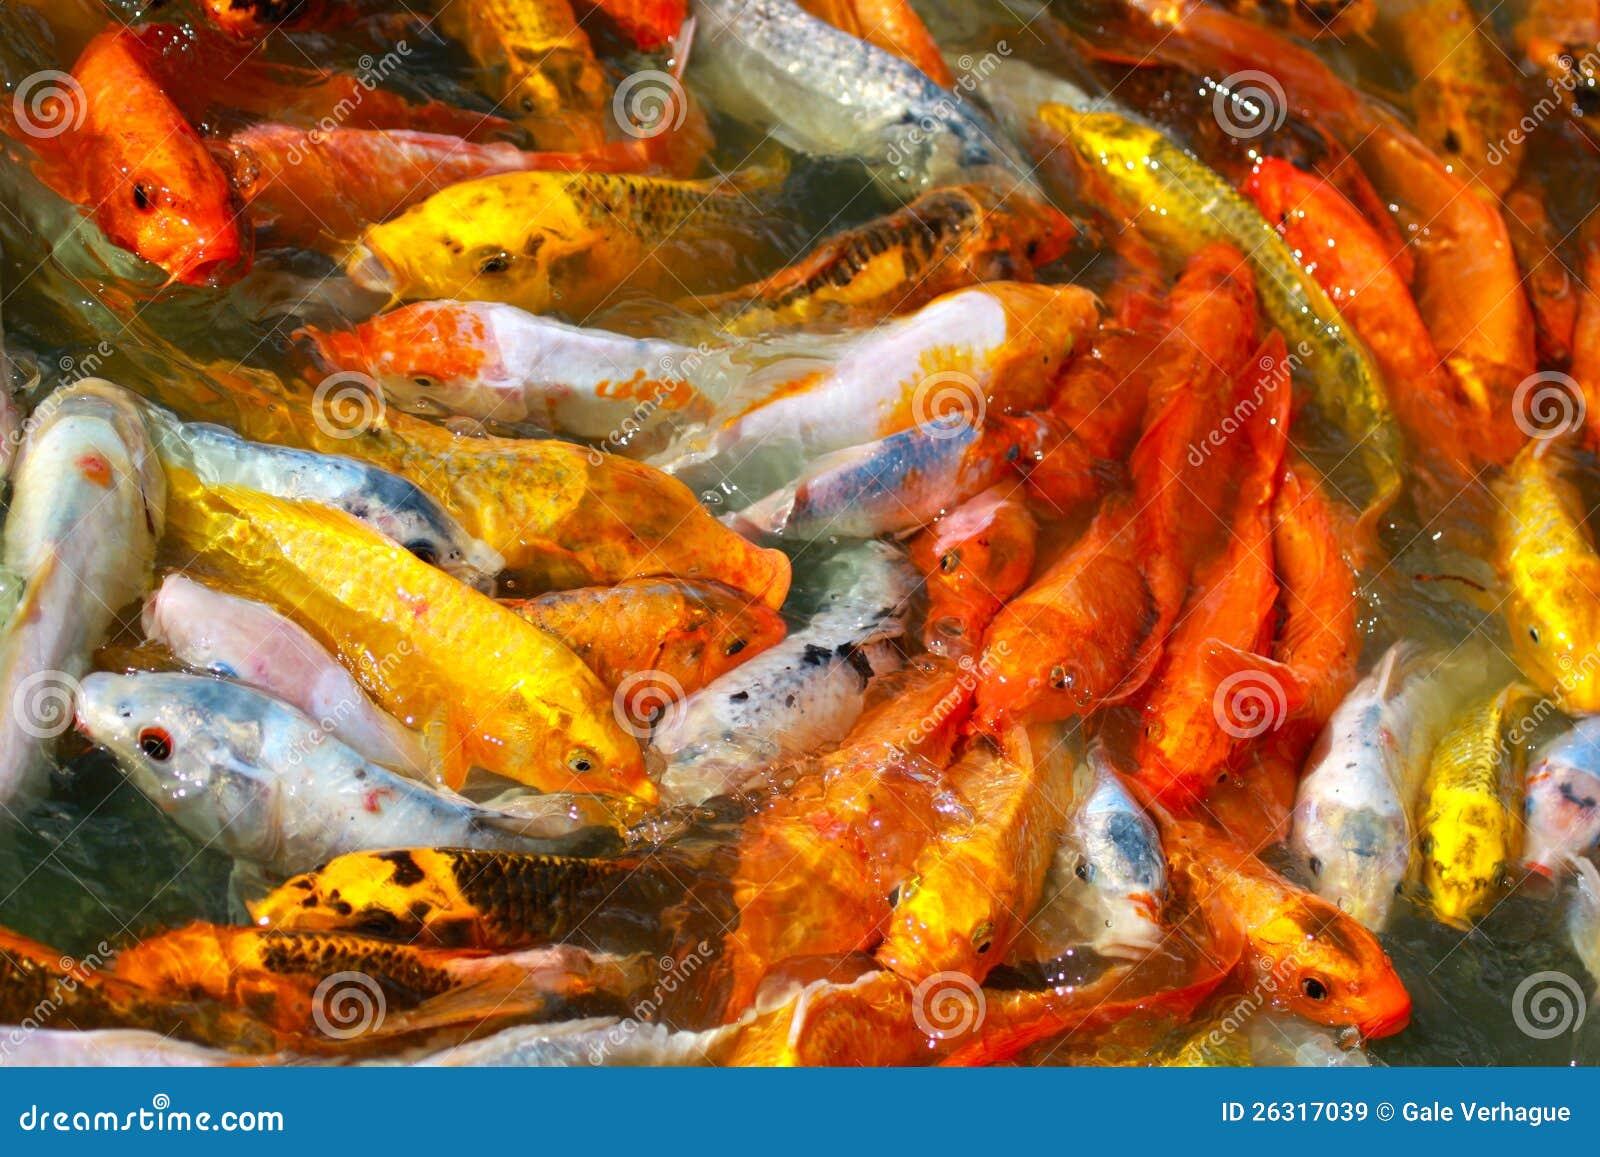 Japanese koi fish feeding frenzy royalty free stock images for Feeding koi carp